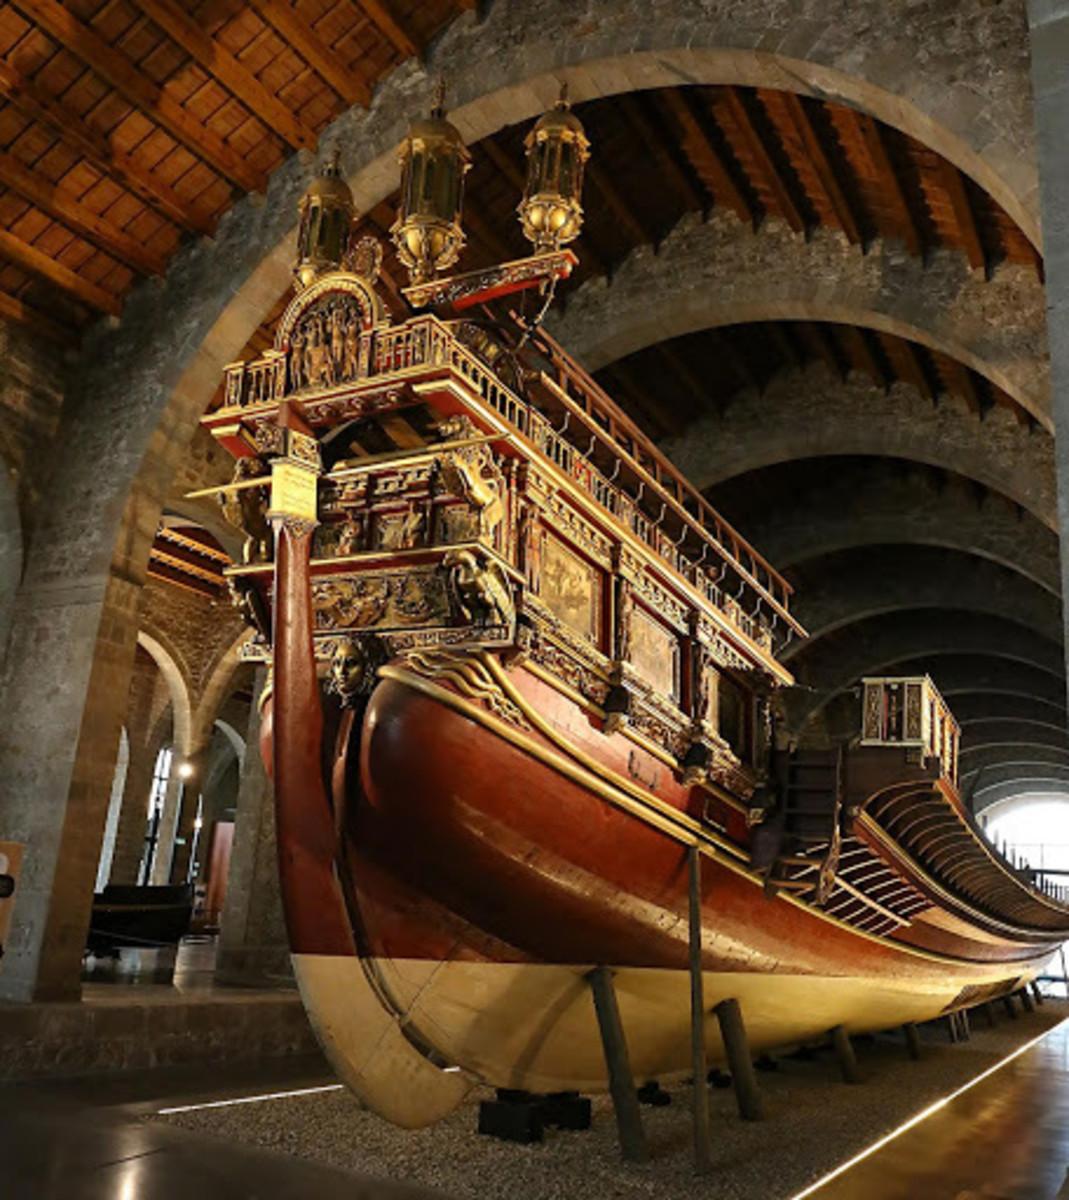 John of Austria's ship, La Real.